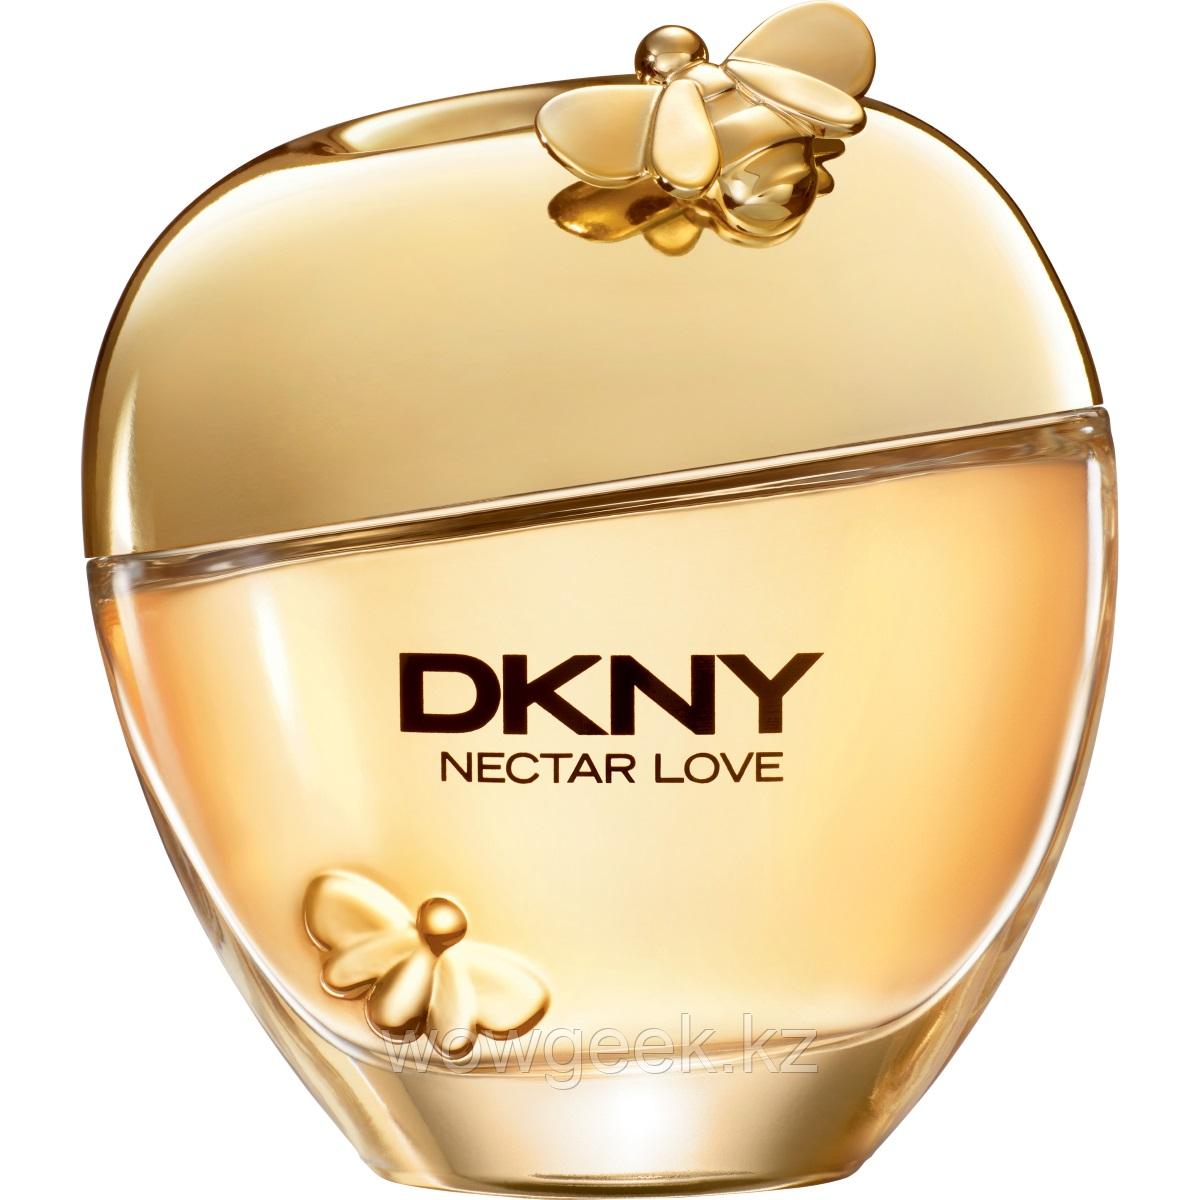 Donna Karan DKNY Nectar Love женский аромат